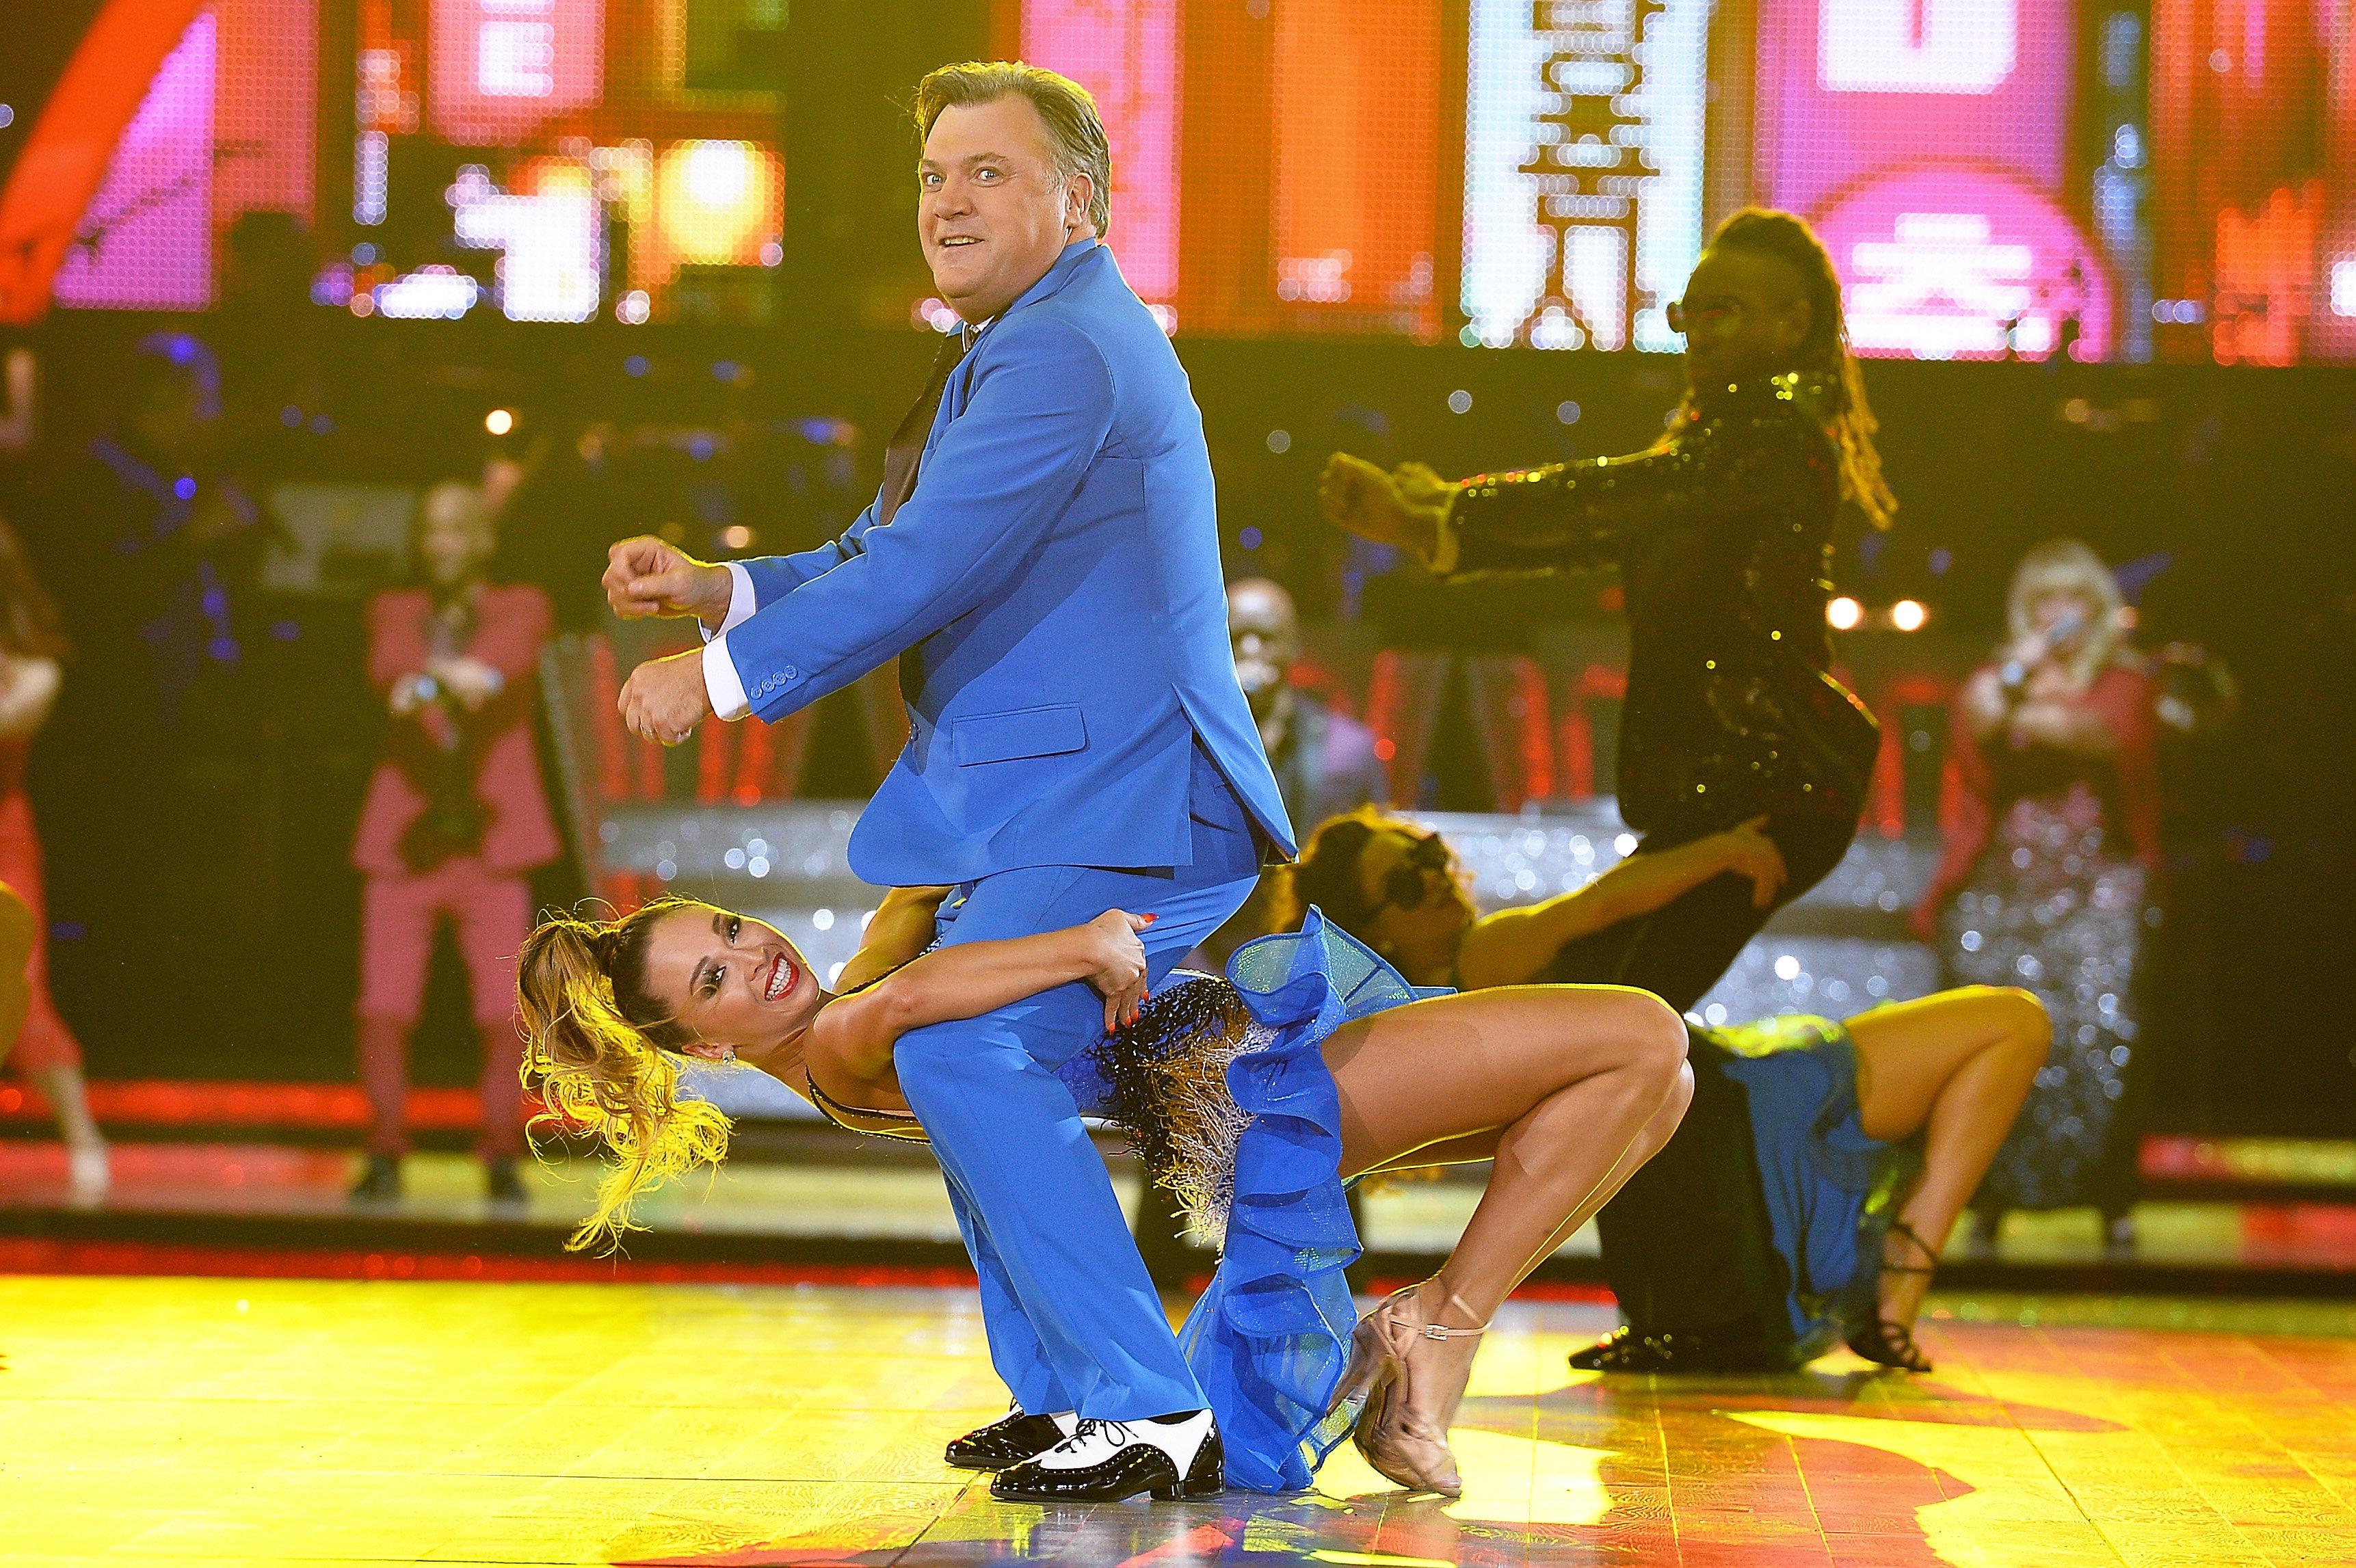 Ed Balls On How 'Strictly' Partner Katya Jones Puts Him In Mind Of Gordon